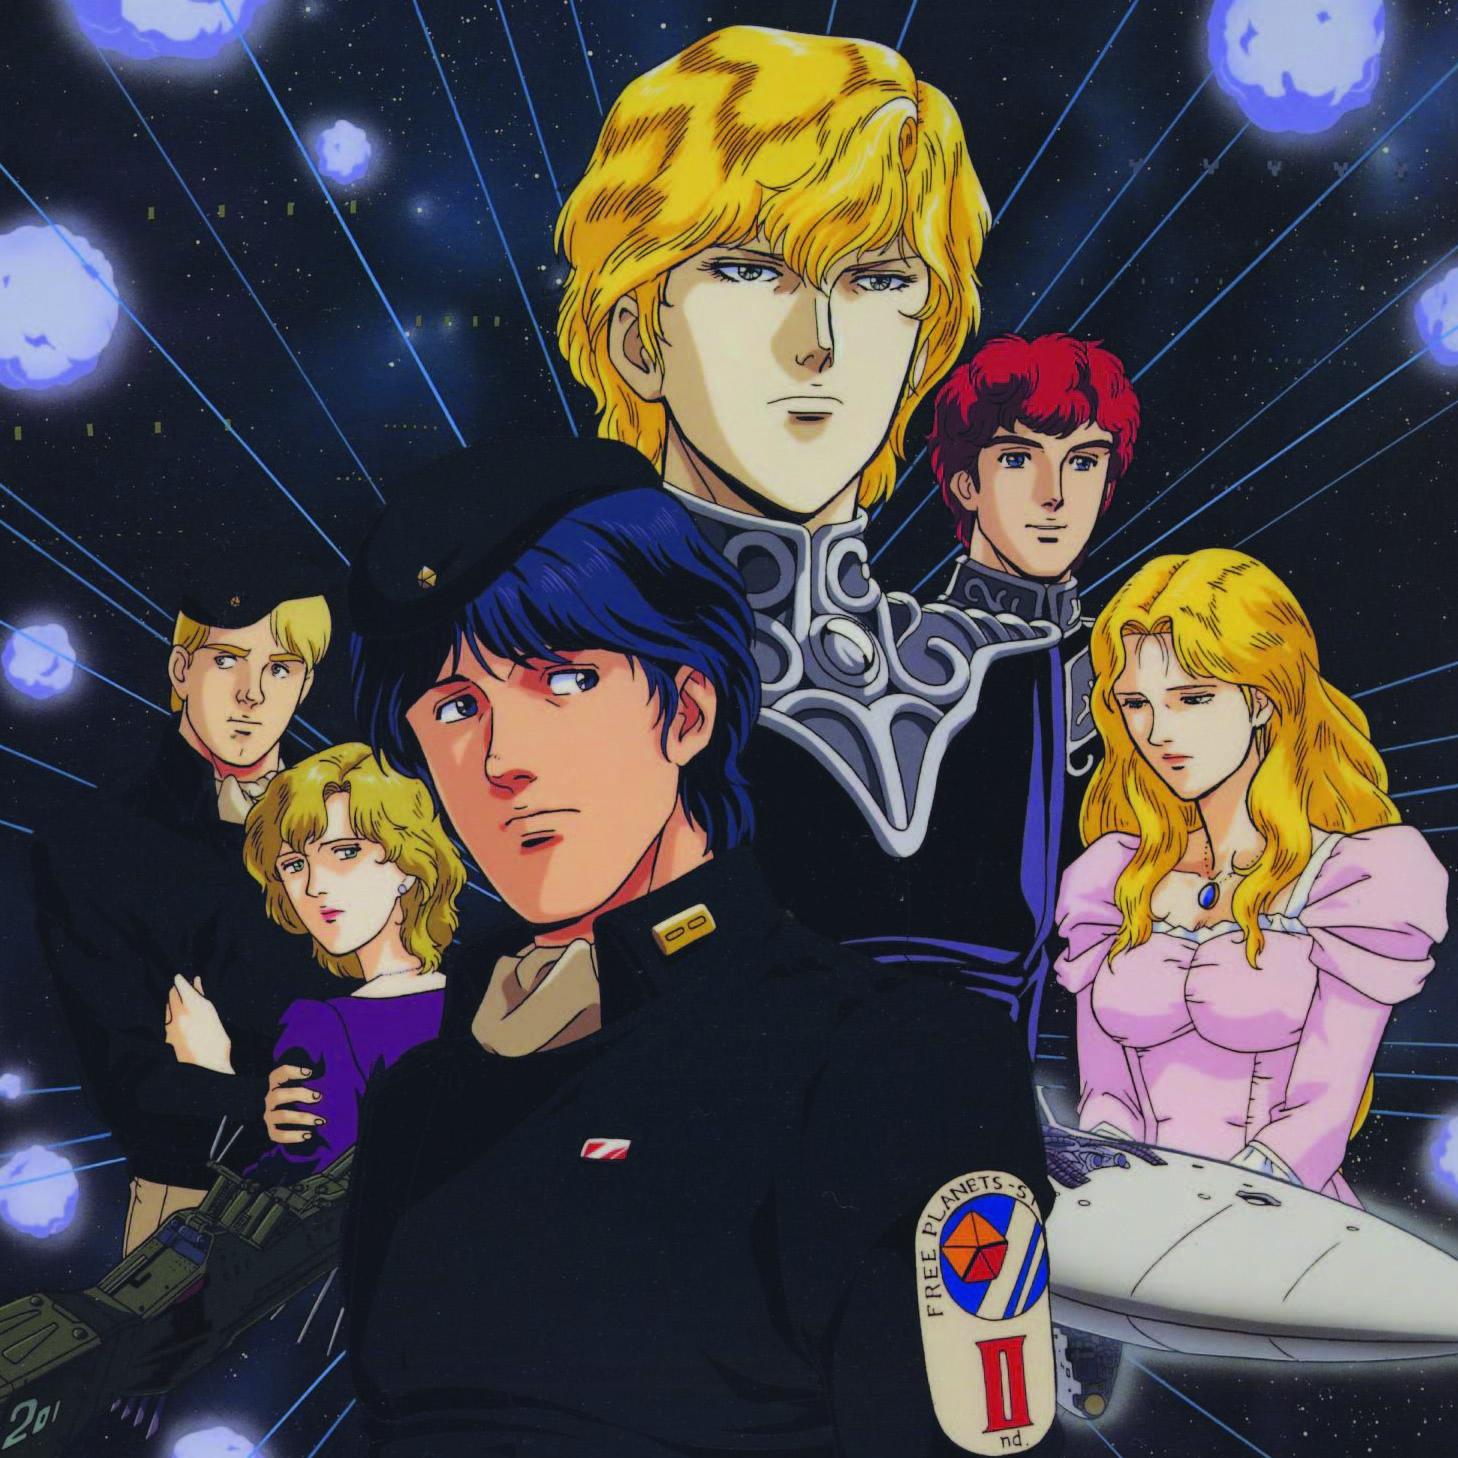 Ginga Eiyuu Densetsu(Legend of the Galactic Heroes) Movie